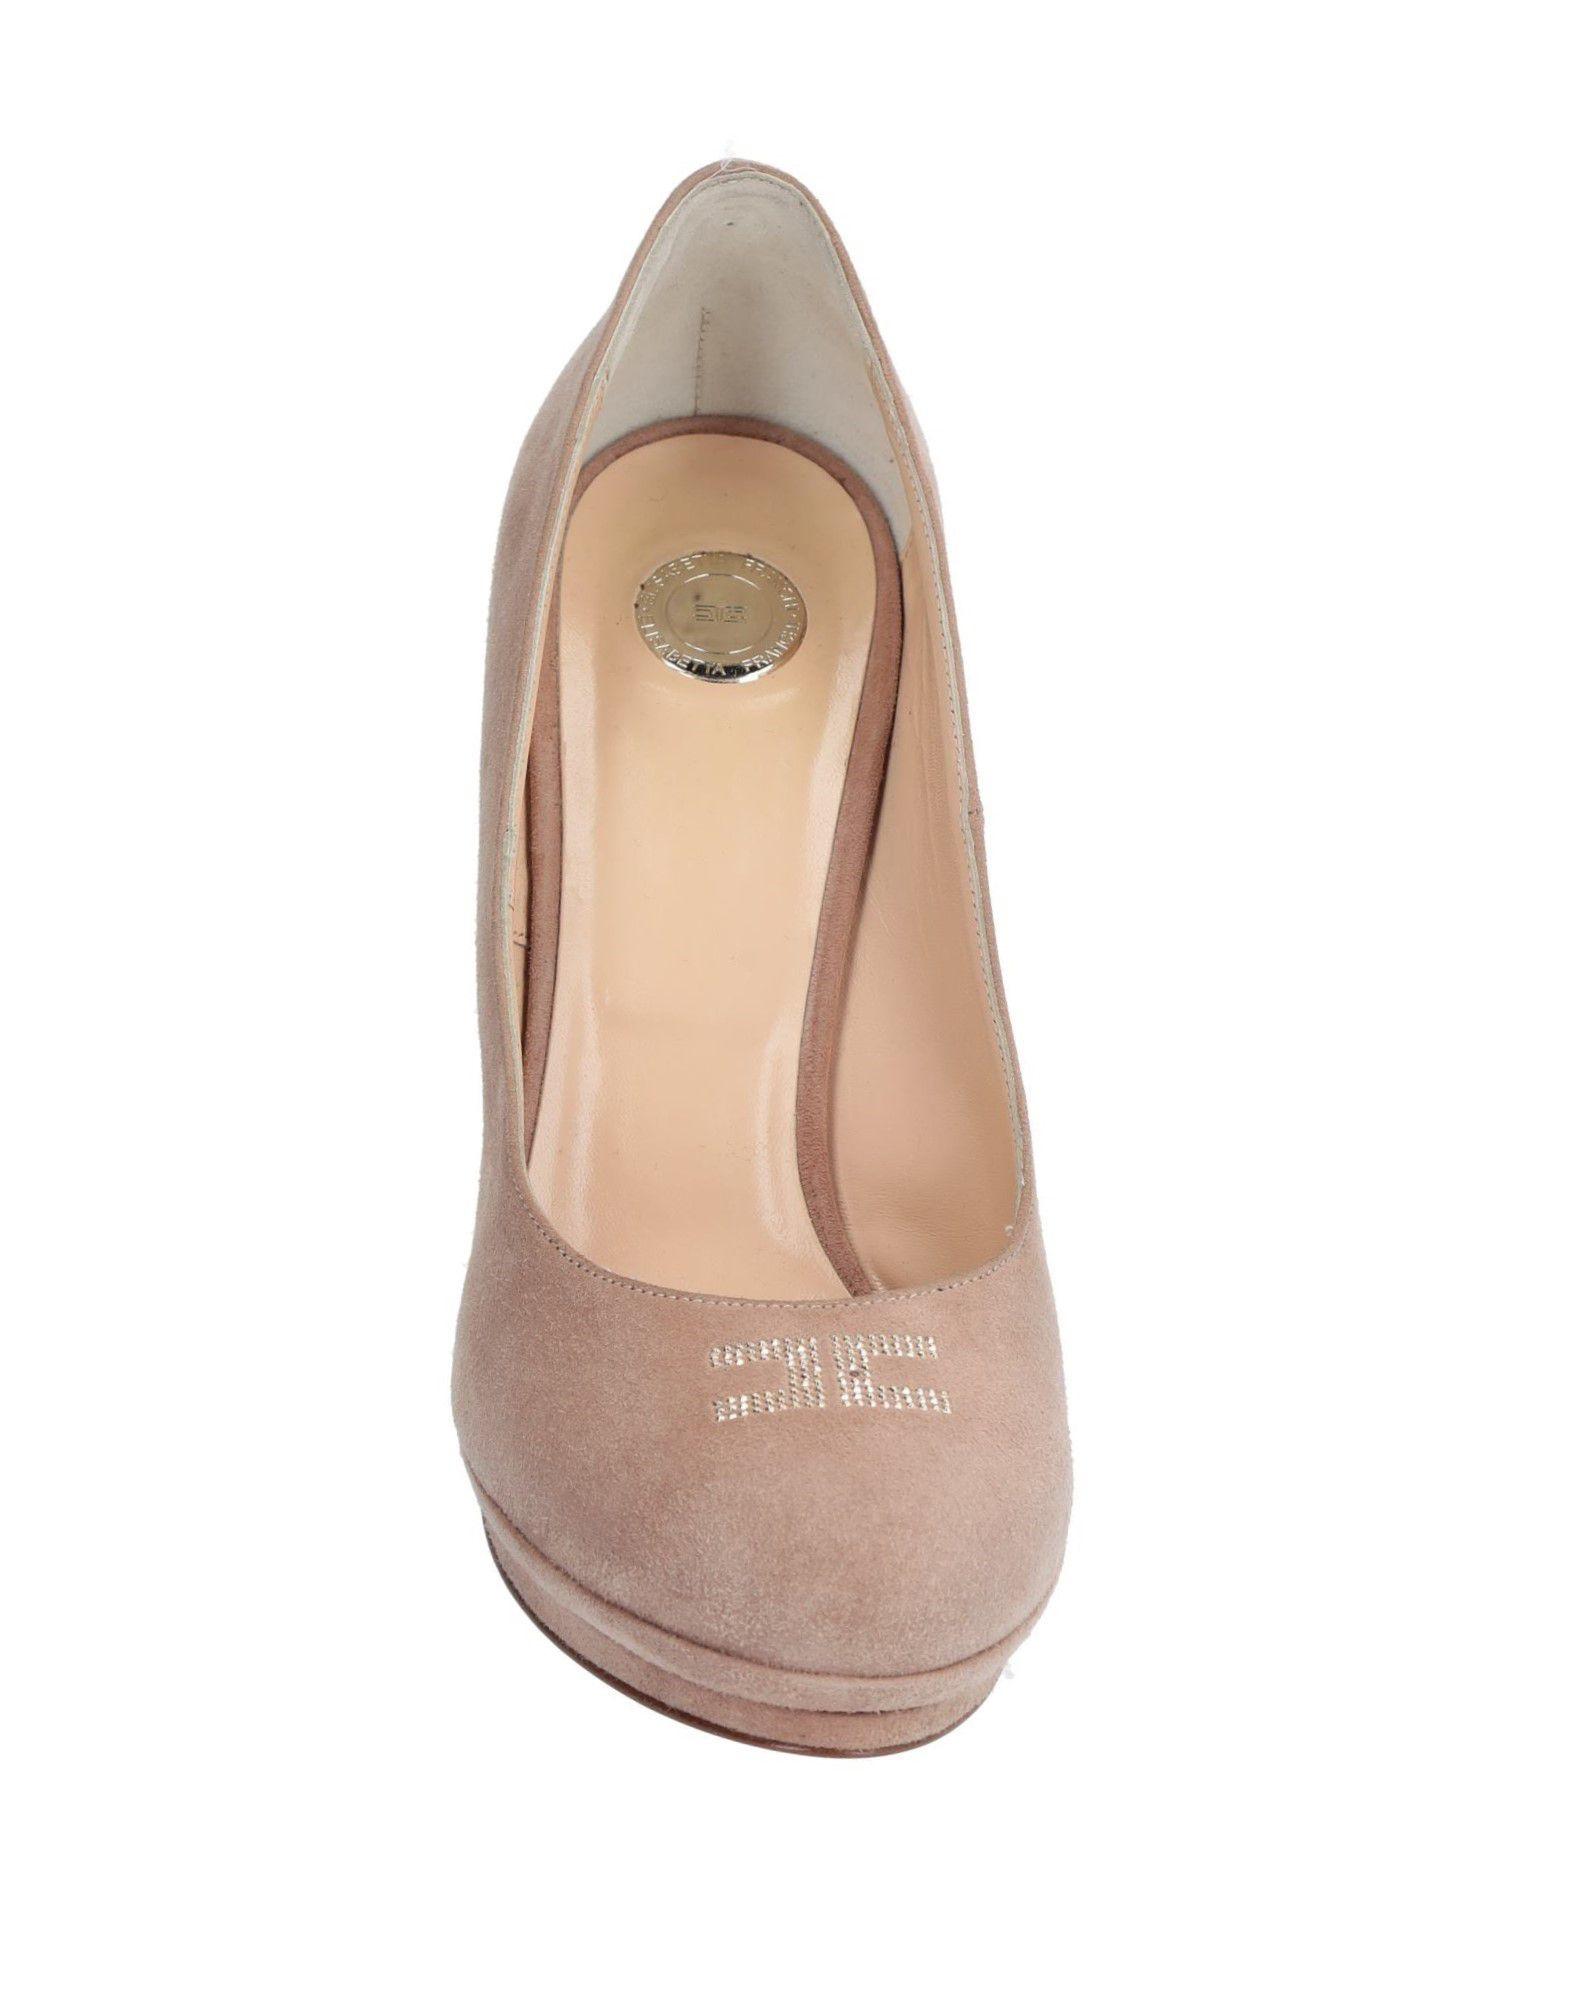 Elisabetta Franchi Pumps Damen Damen Pumps  11541471JJ Neue Schuhe 0c9cac